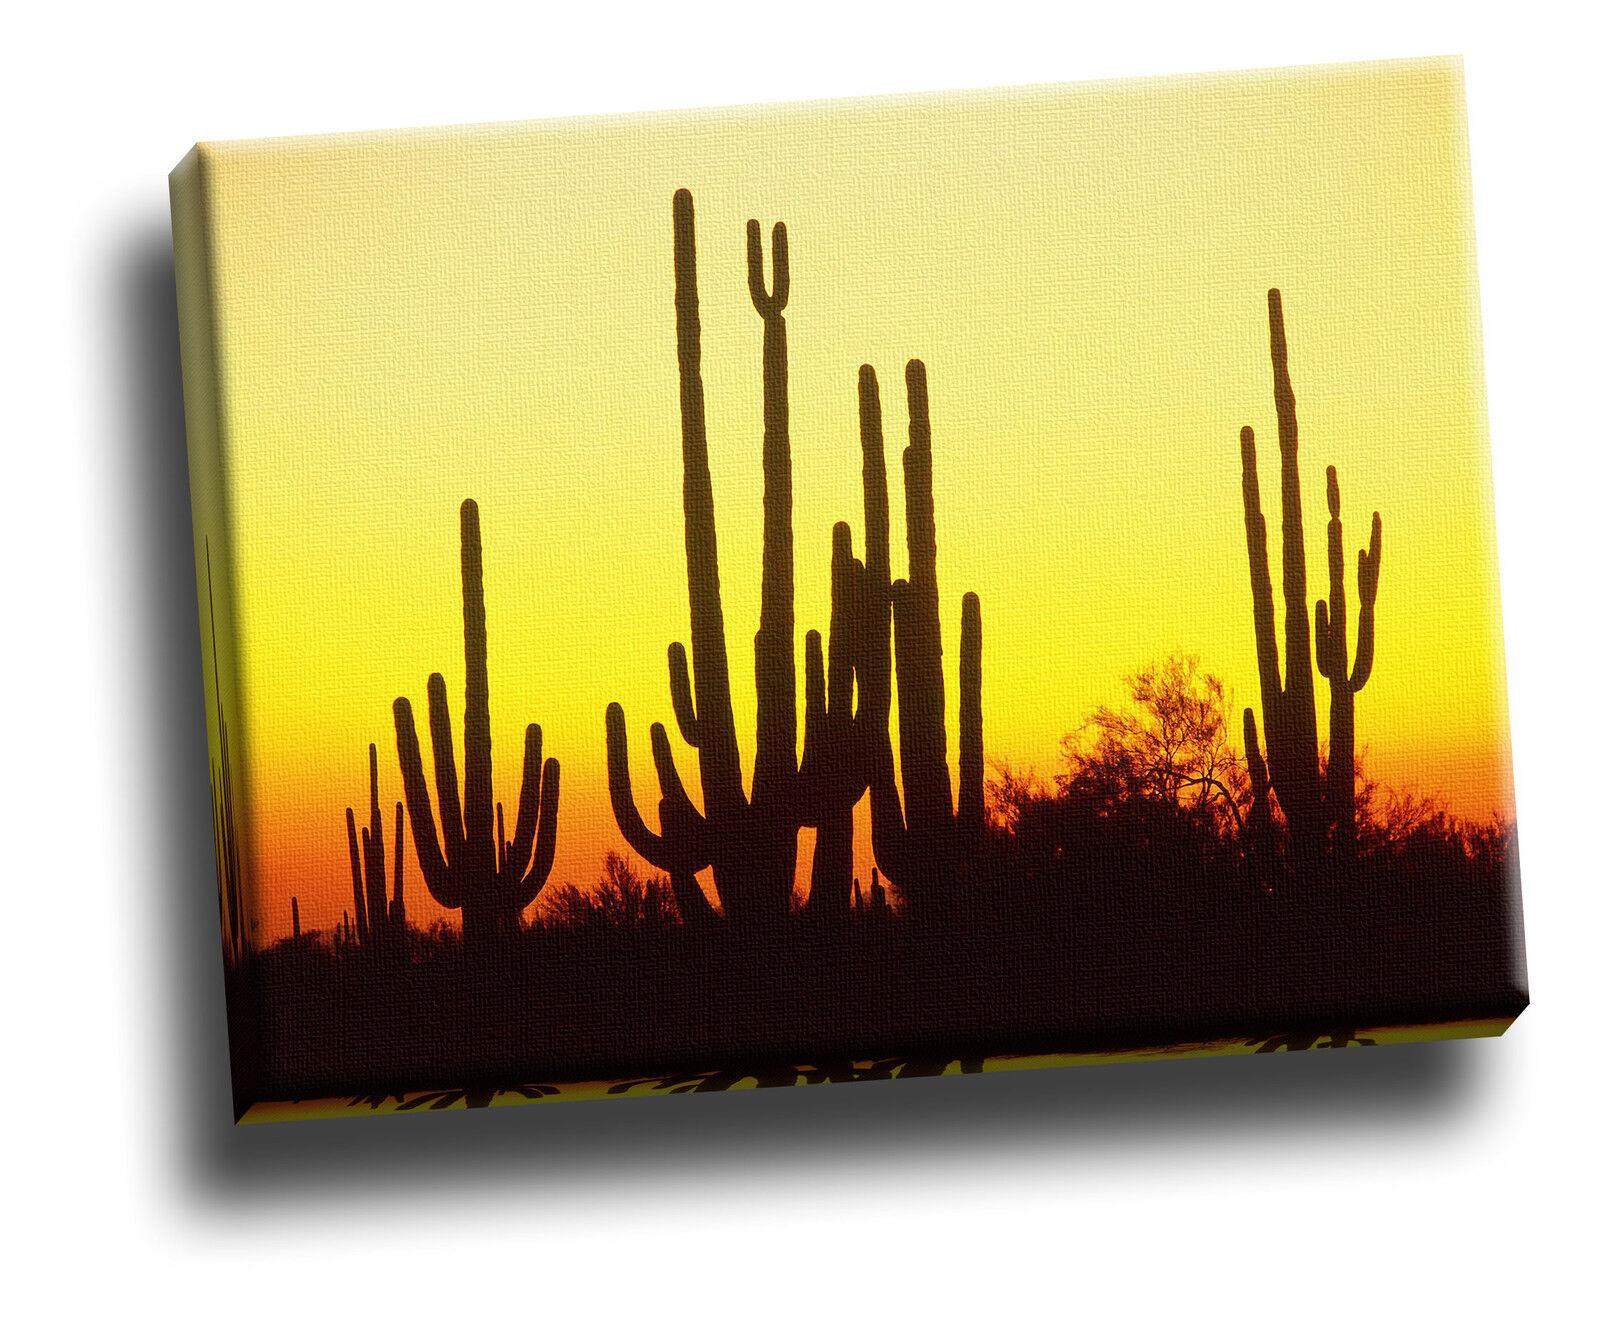 Saguaro Cactus at Sunset, Arizona Giclee Canvas Picture Wall Art